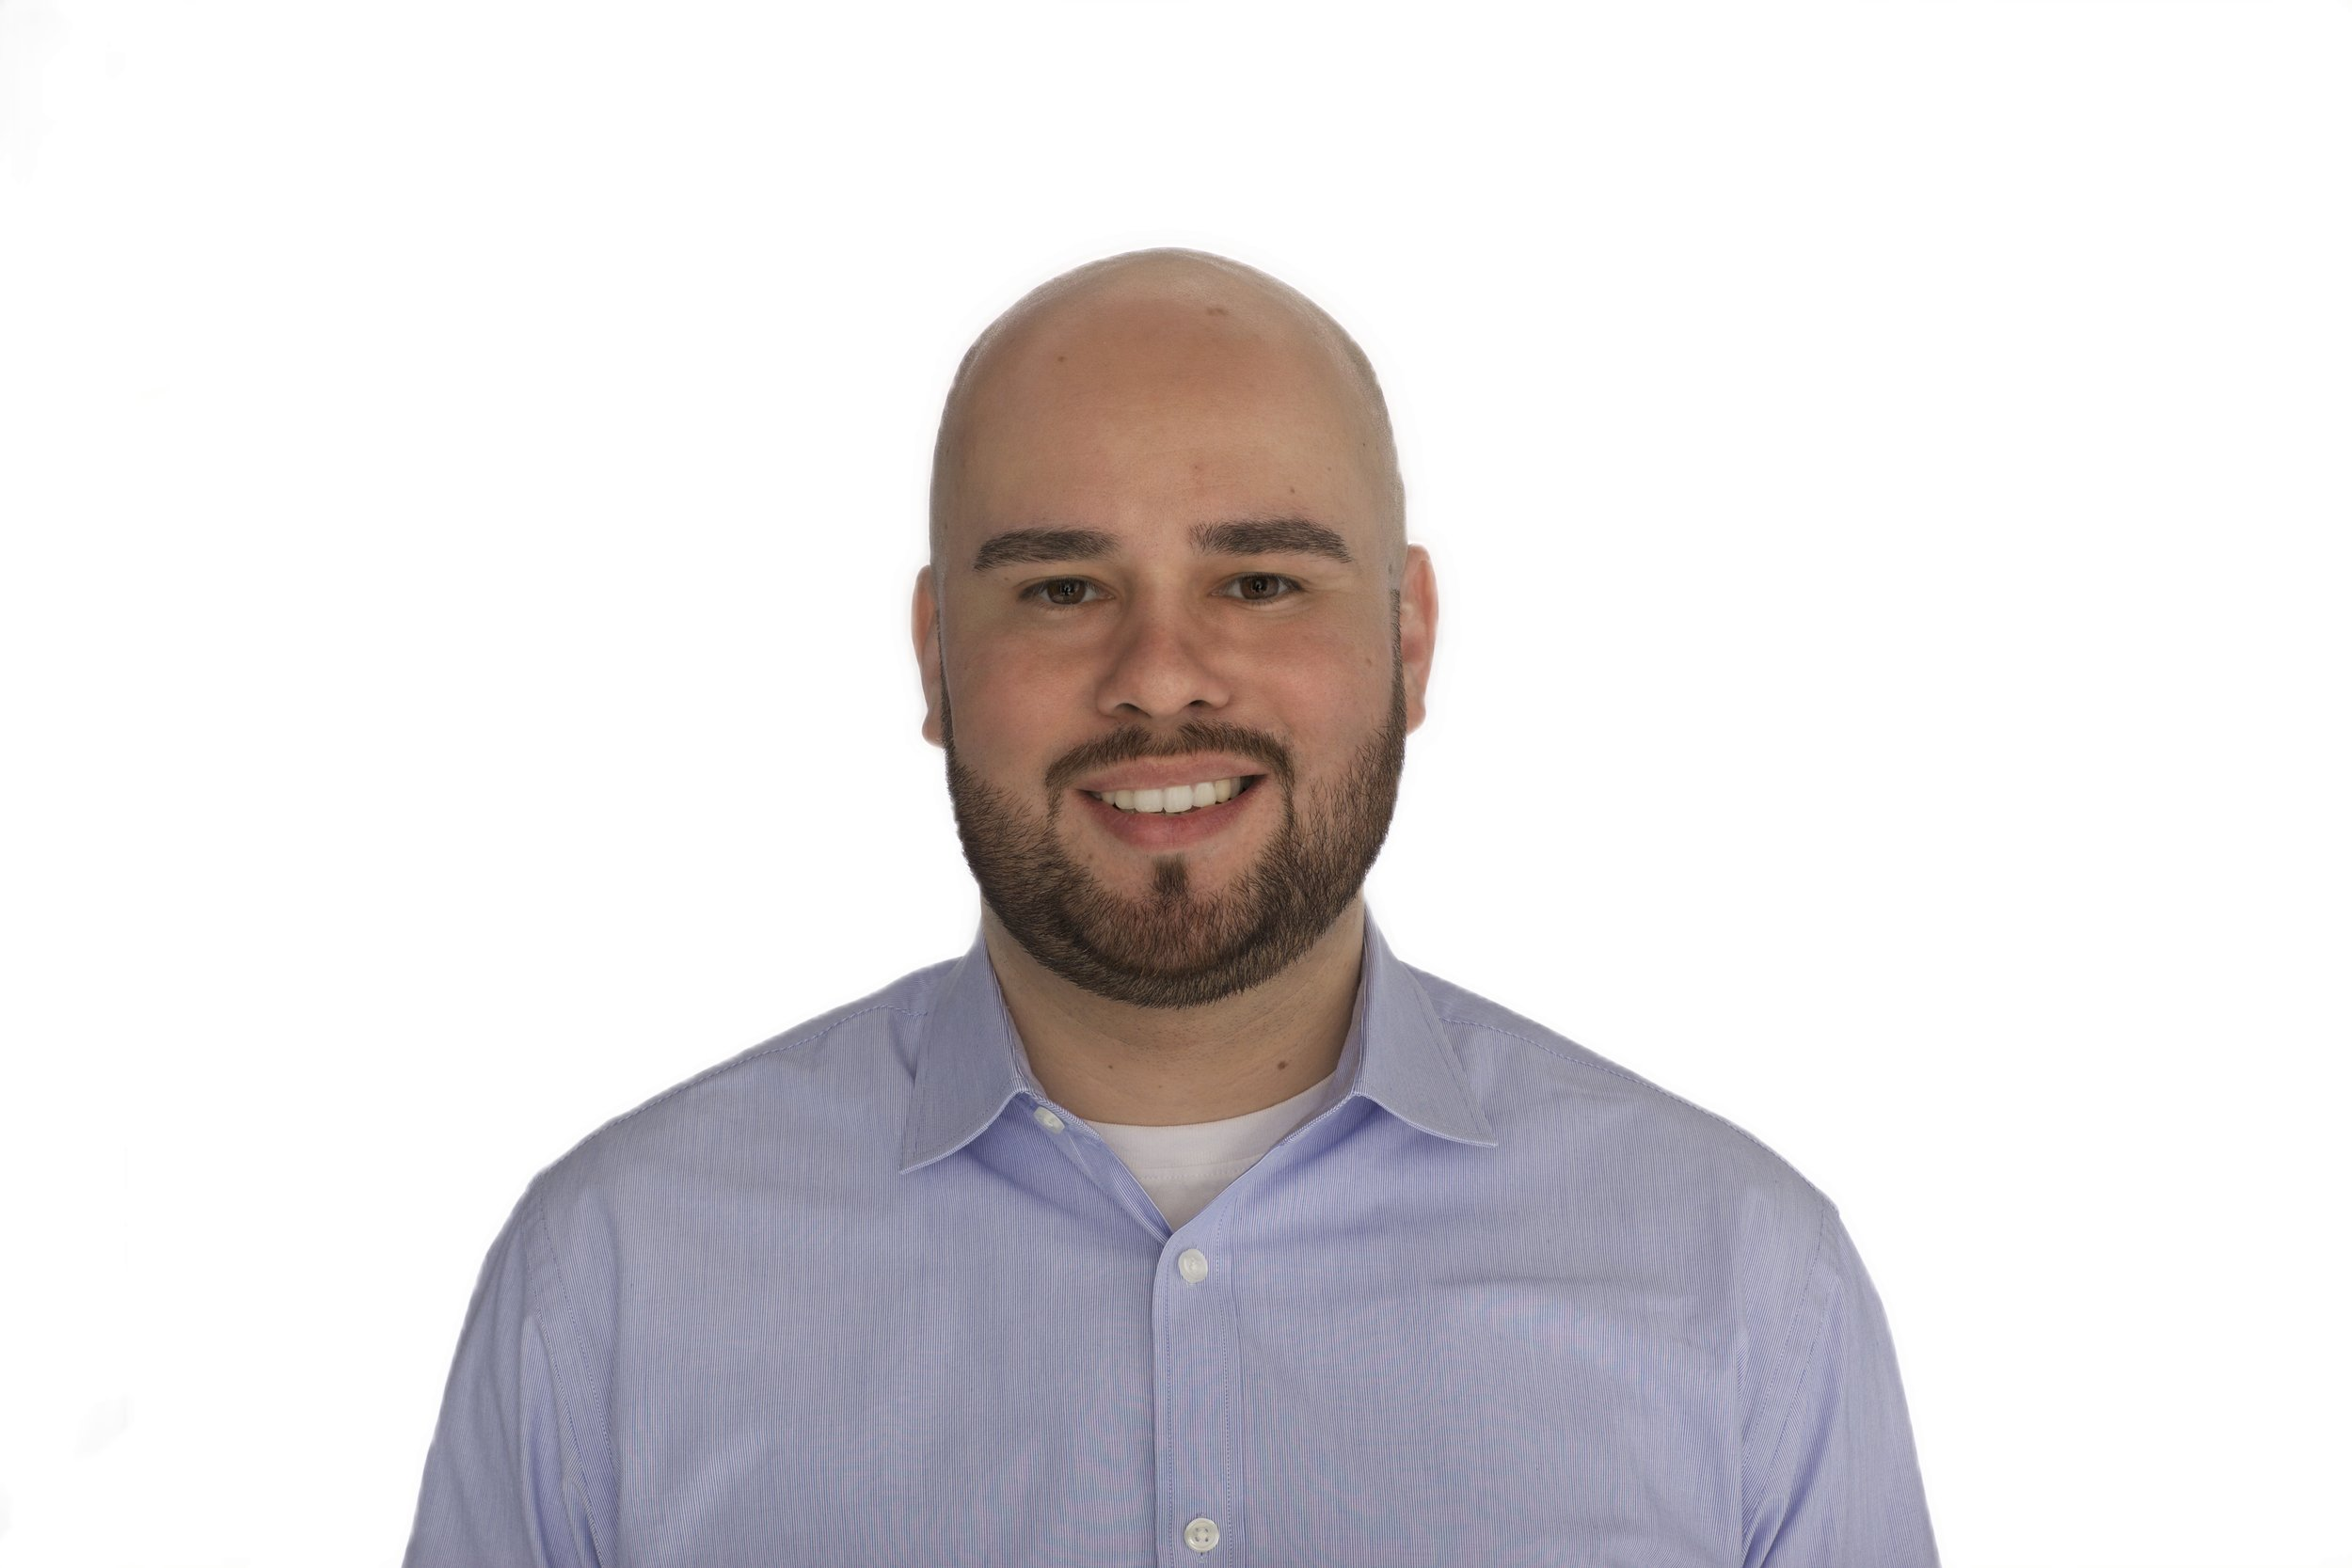 Mike Headshot_pp copy.jpg